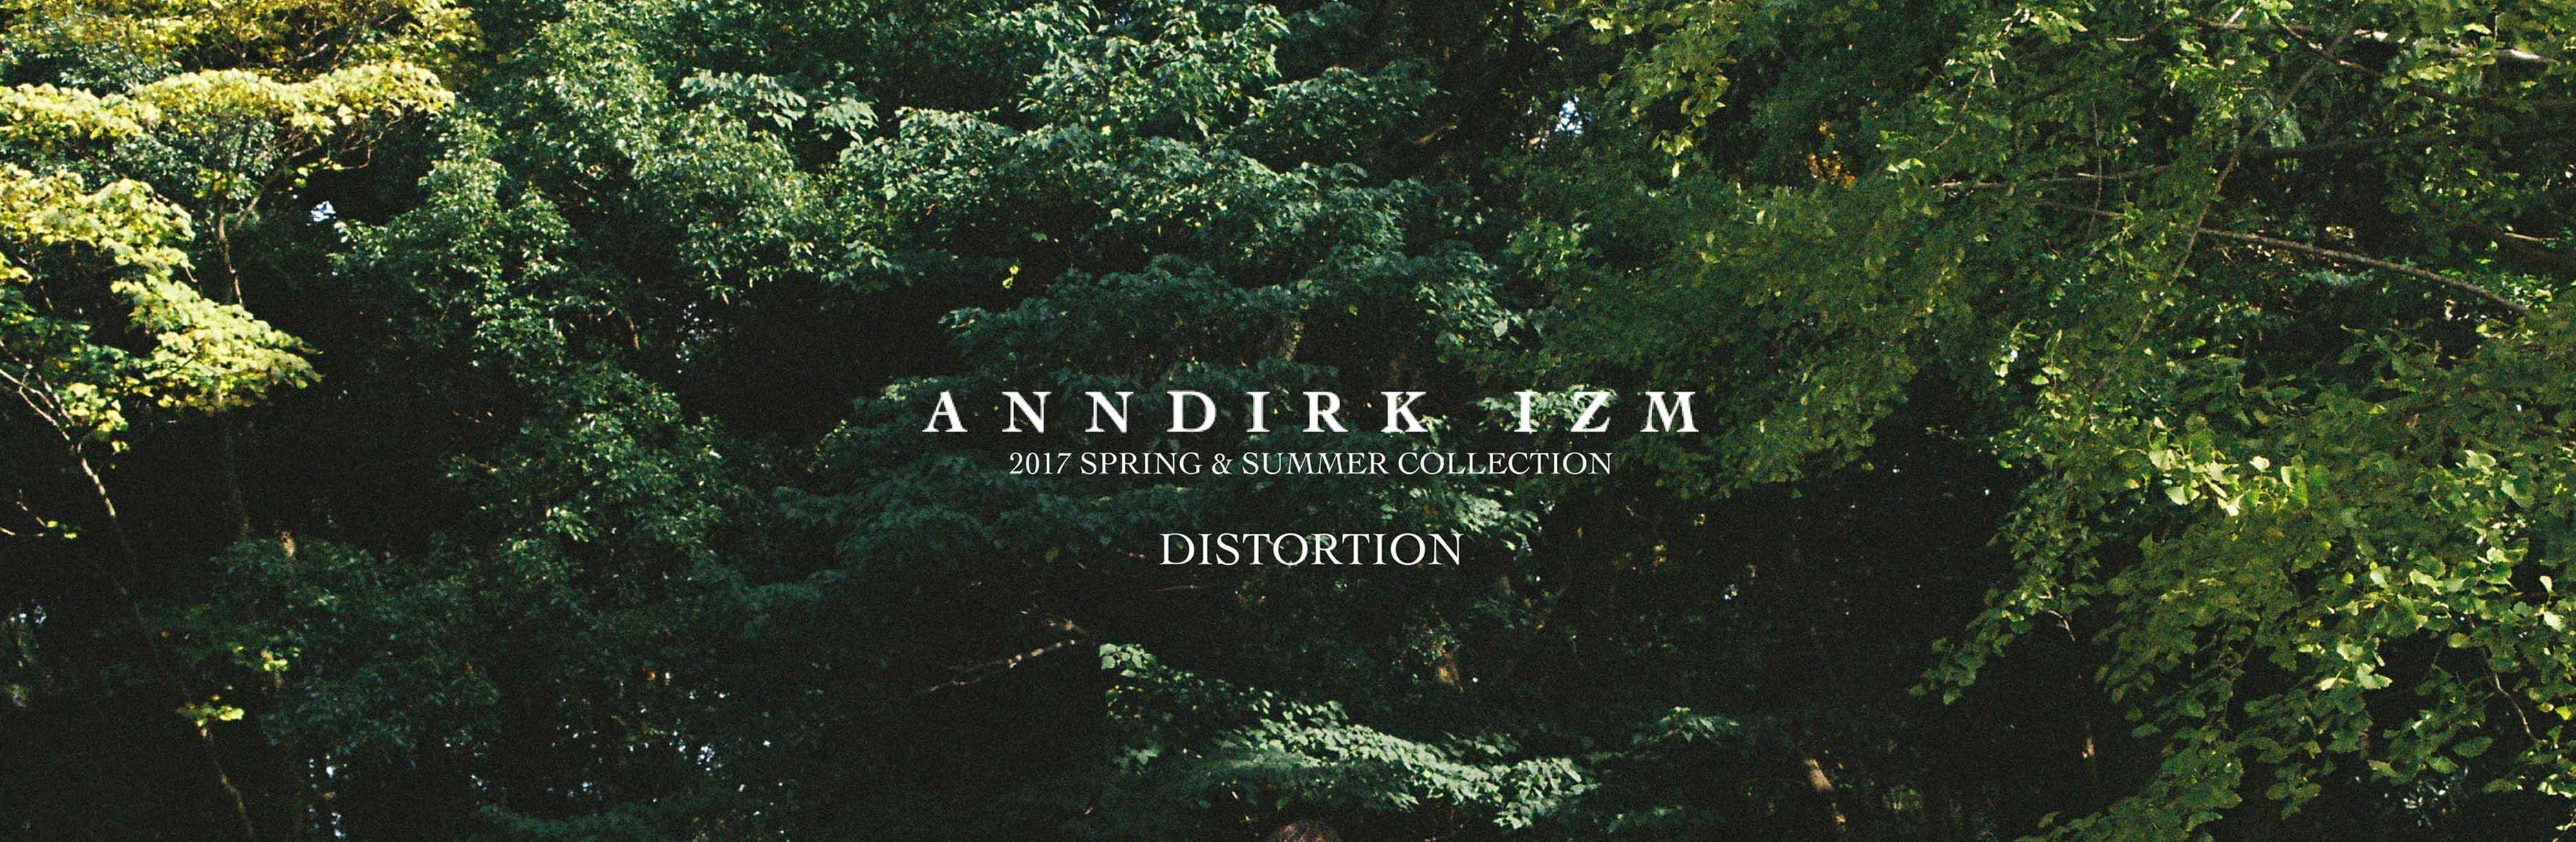 ANNDIRK IZM(アンダークイズム)」Spring/Summer